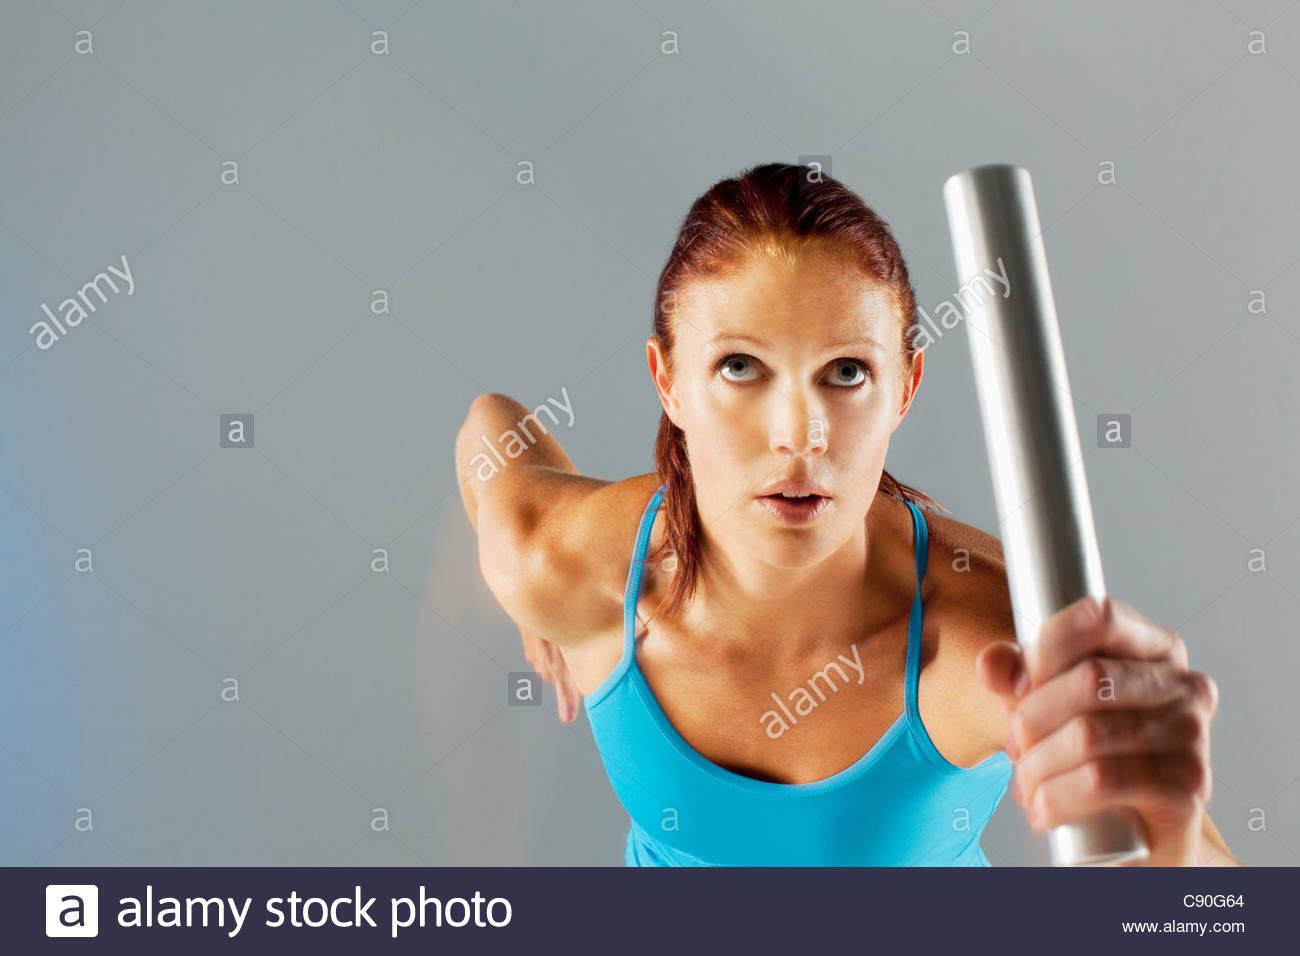 Runner carrying baton - Stock Image